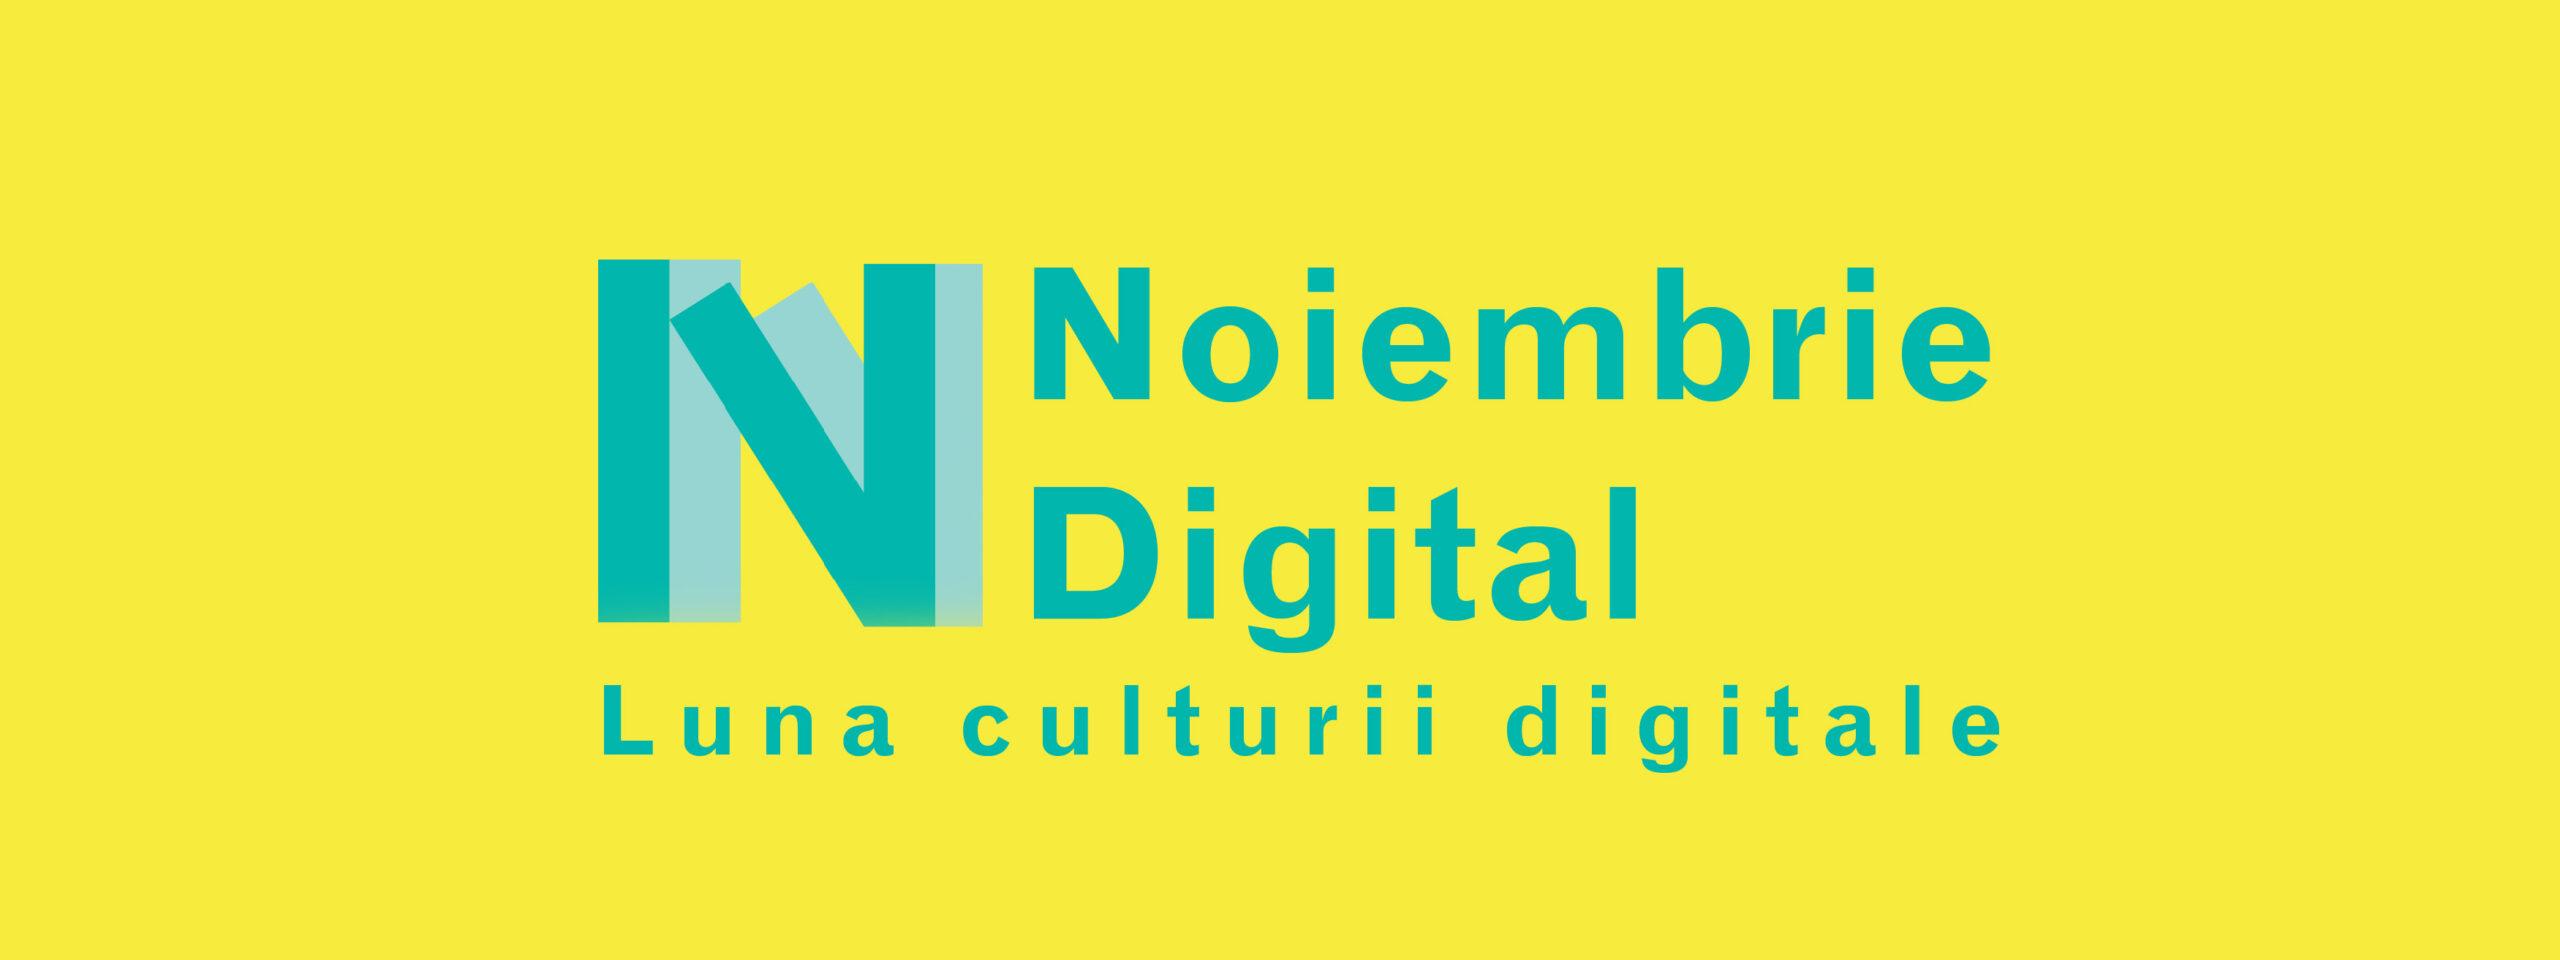 Noiembrie digital 2020